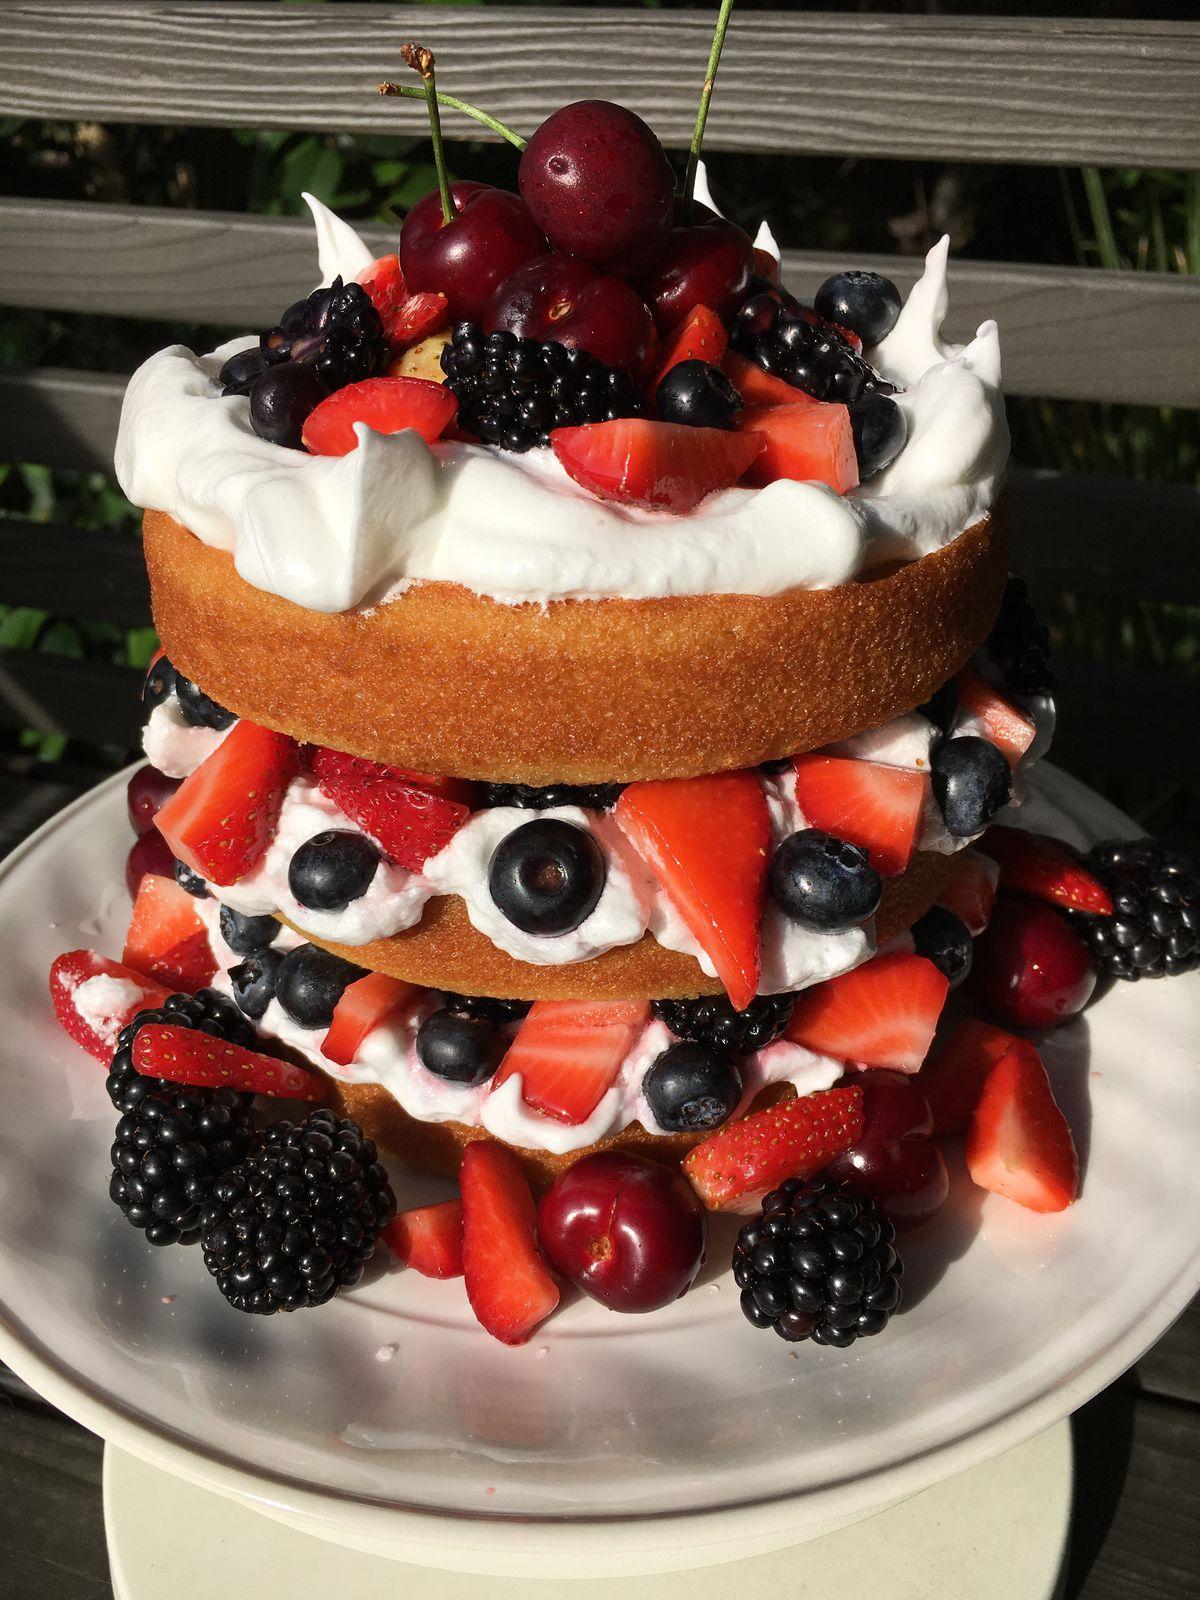 Buttermilk cake with fresh berries. | COURTESY WAYLYNN LUCAS/ FOOD NETWORK